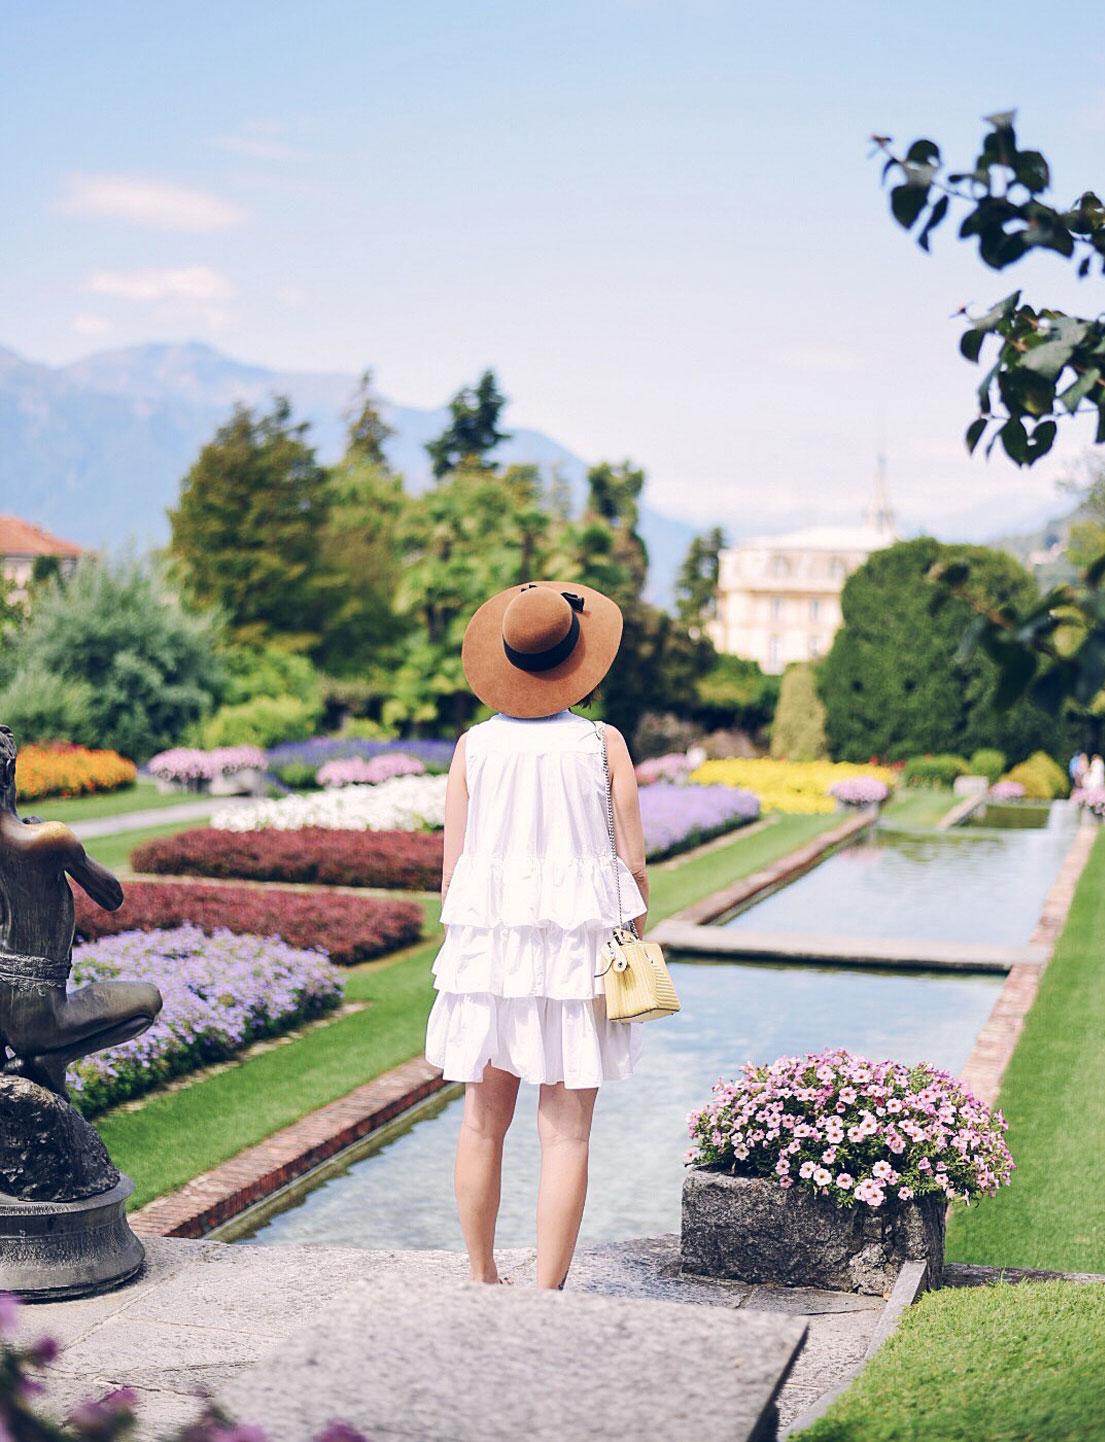 The Gardens of Villa Taranto And Isola Bella